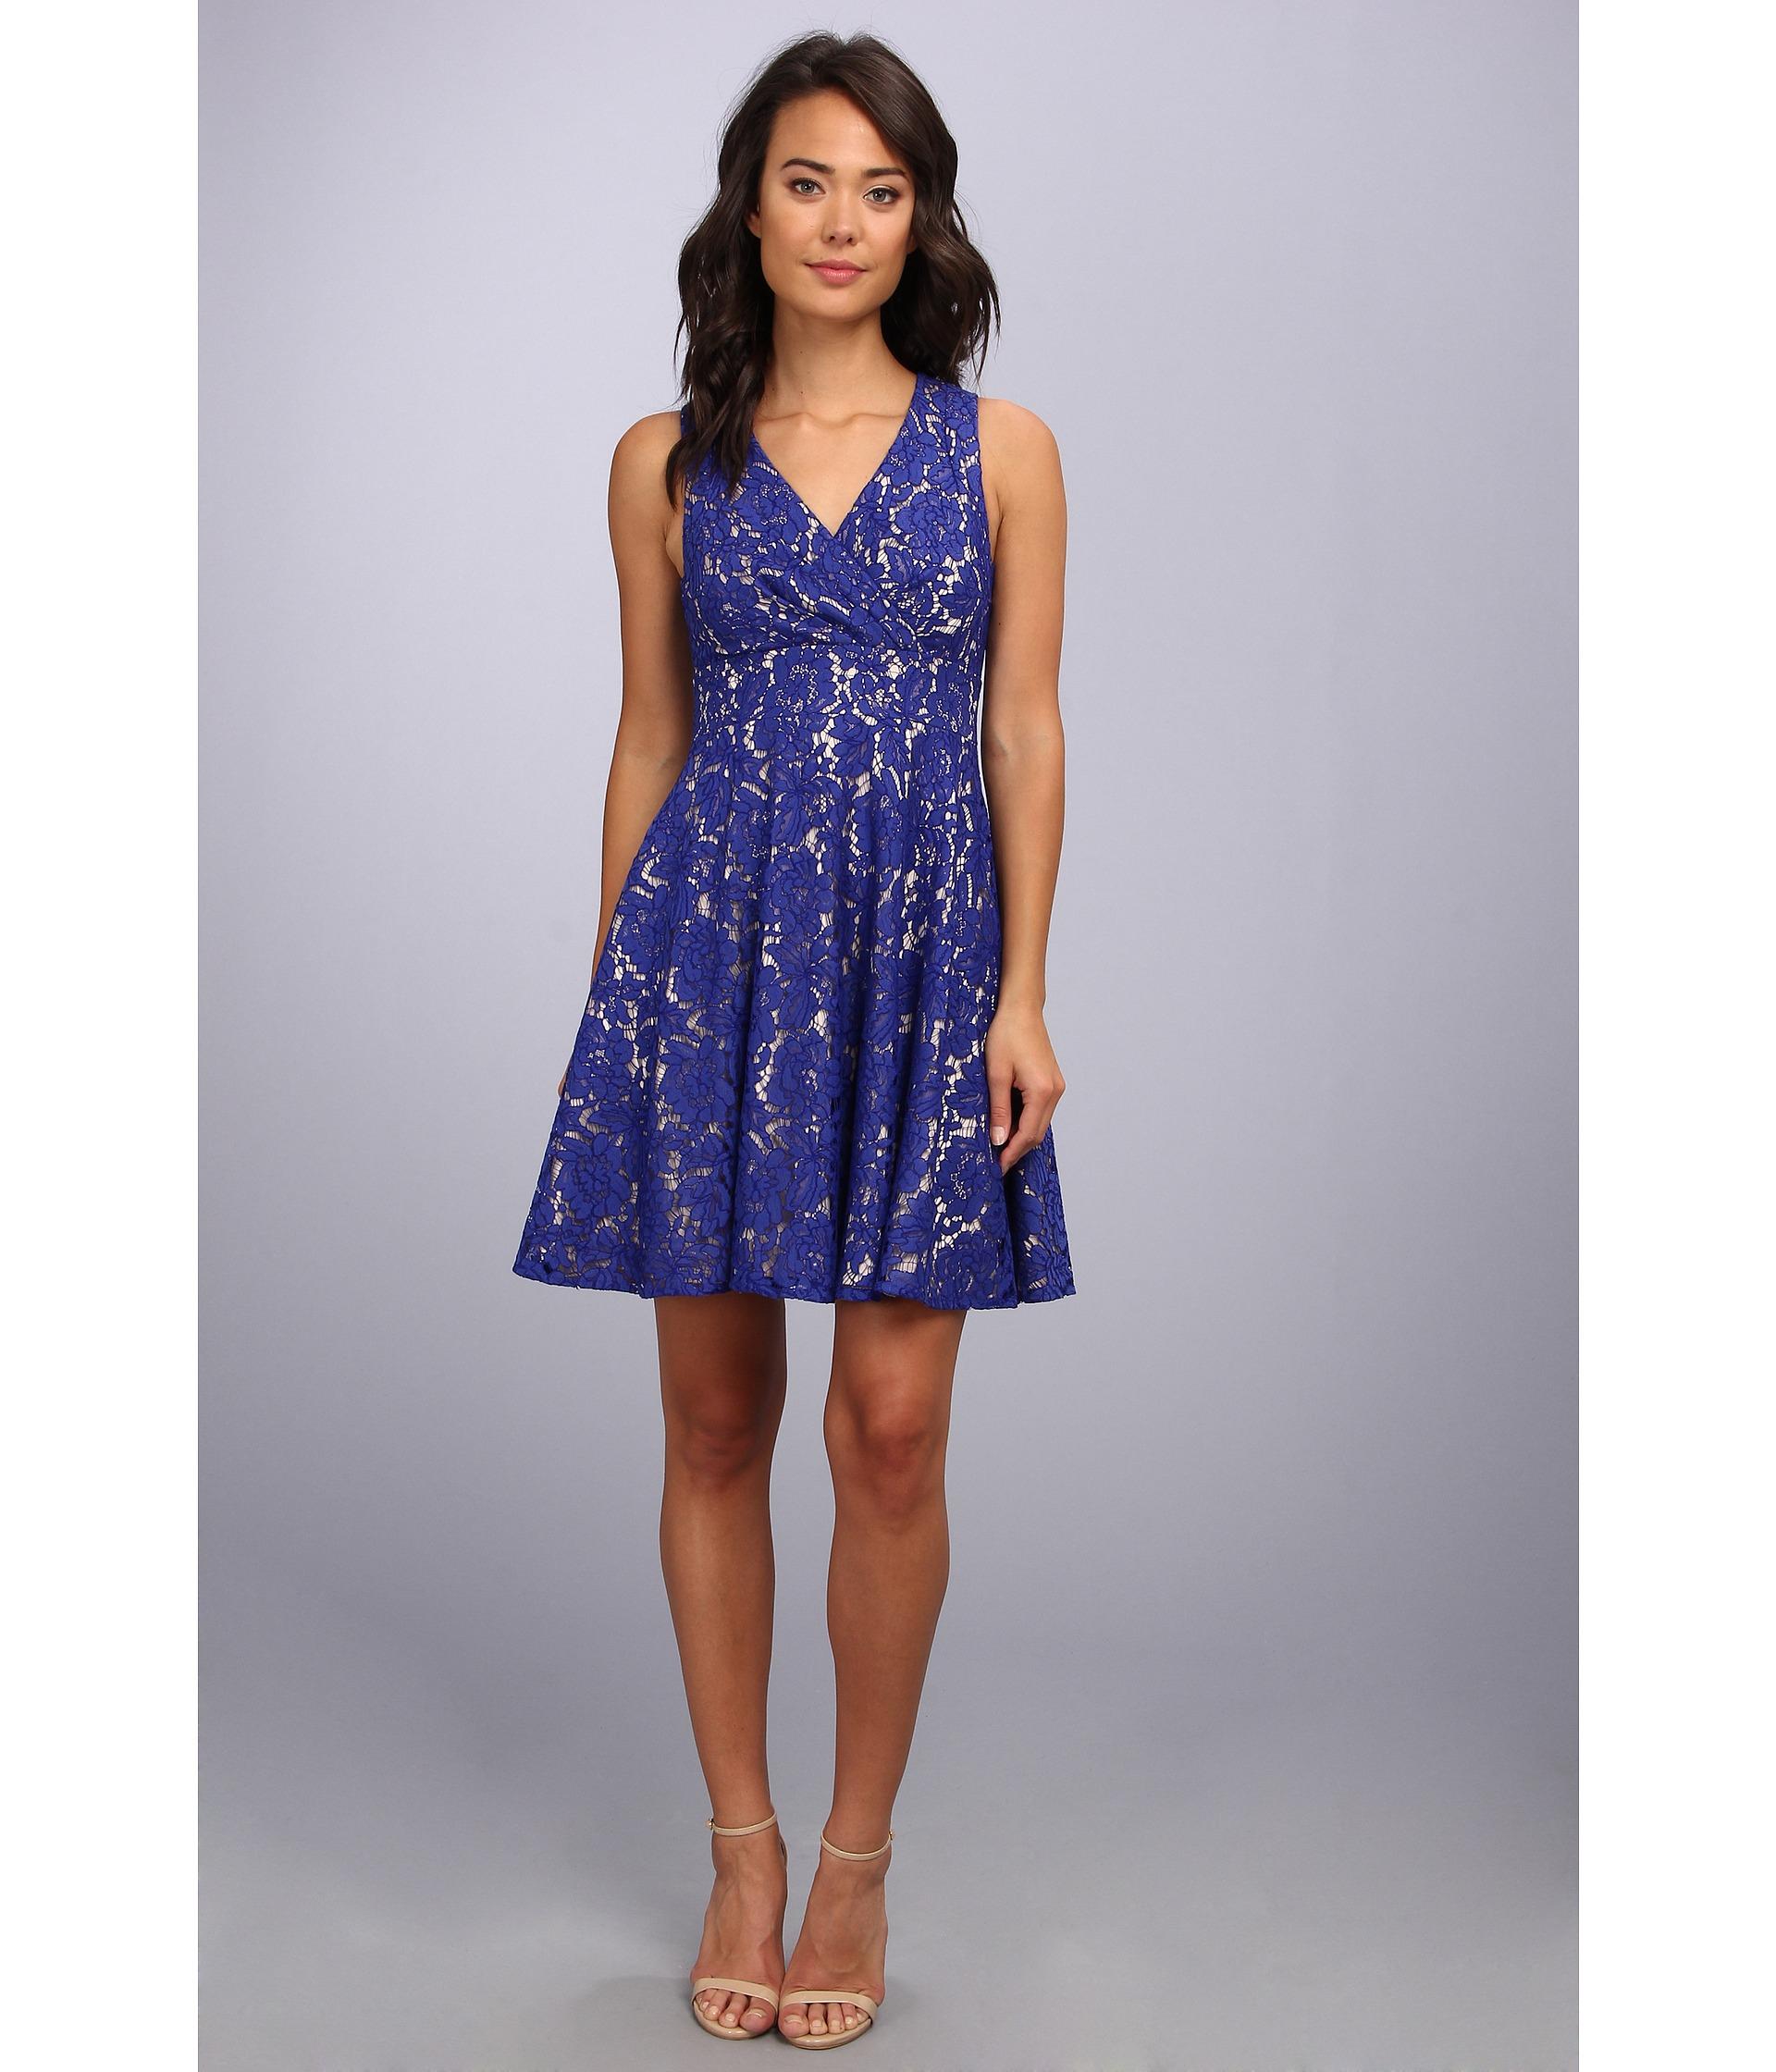 Eliza j blue dress lace